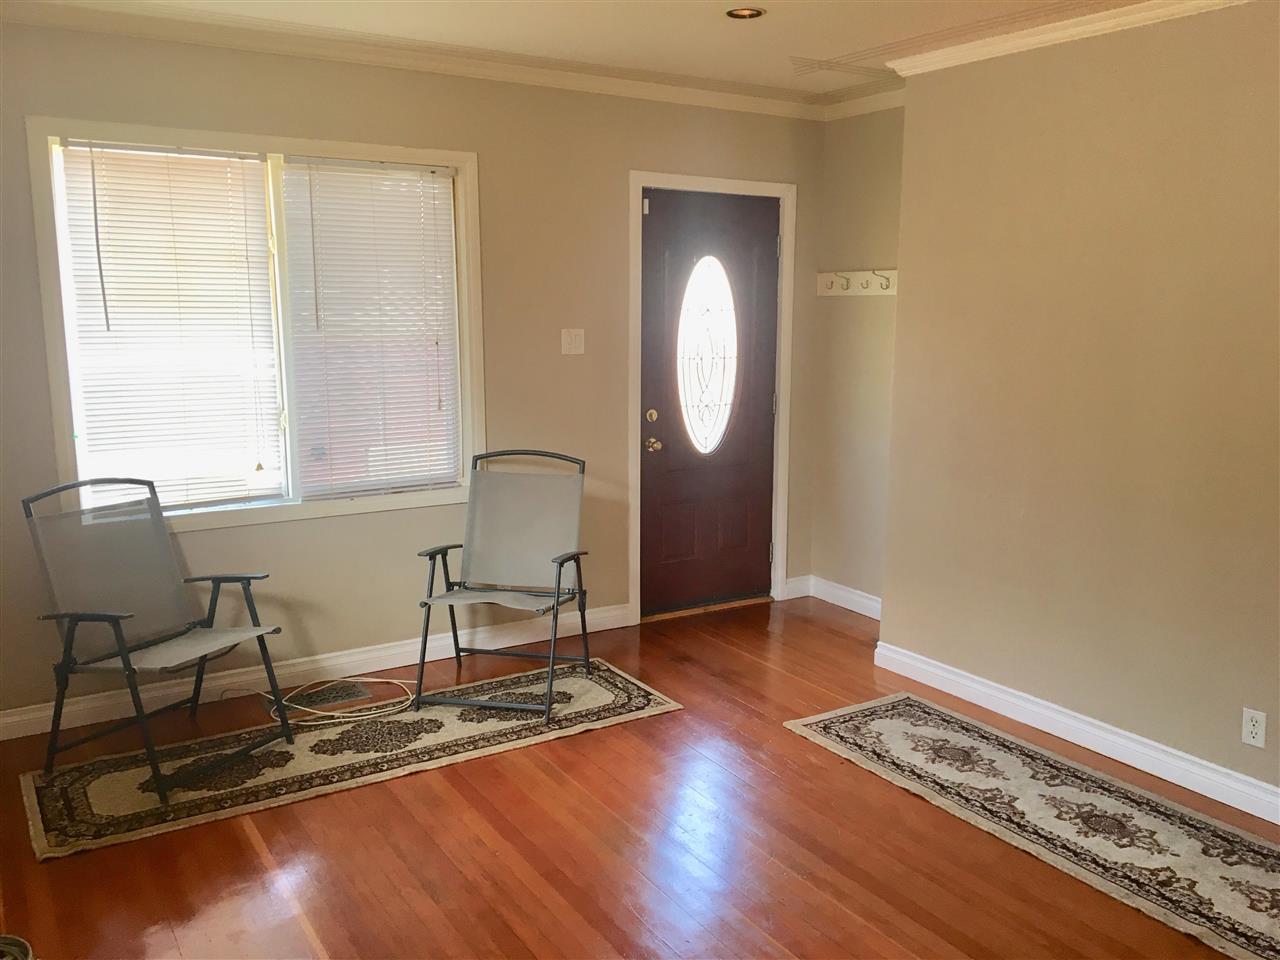 11945 78 Street W, 2 bed, 1 bath, at $185,000